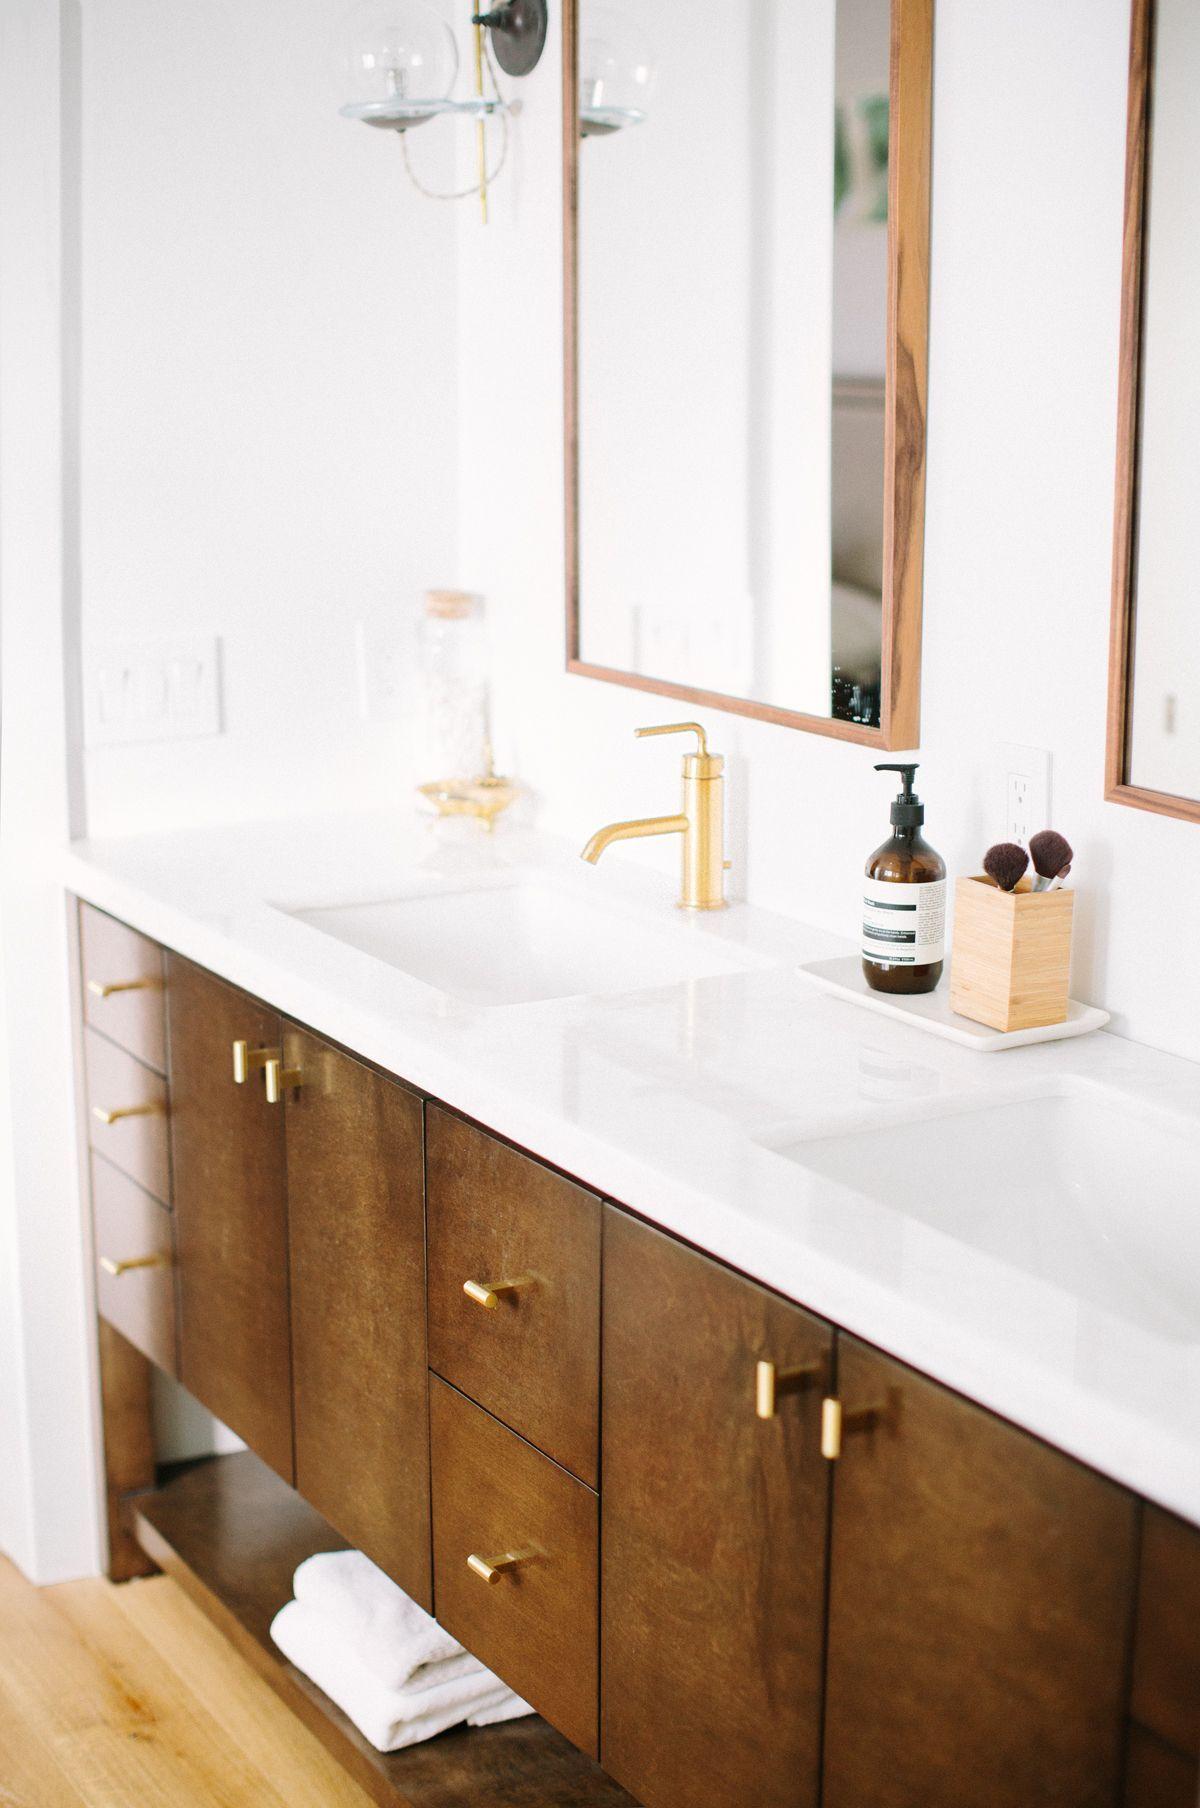 upgrades vanity perfect modern bathroom century mid design with every onsingularity com